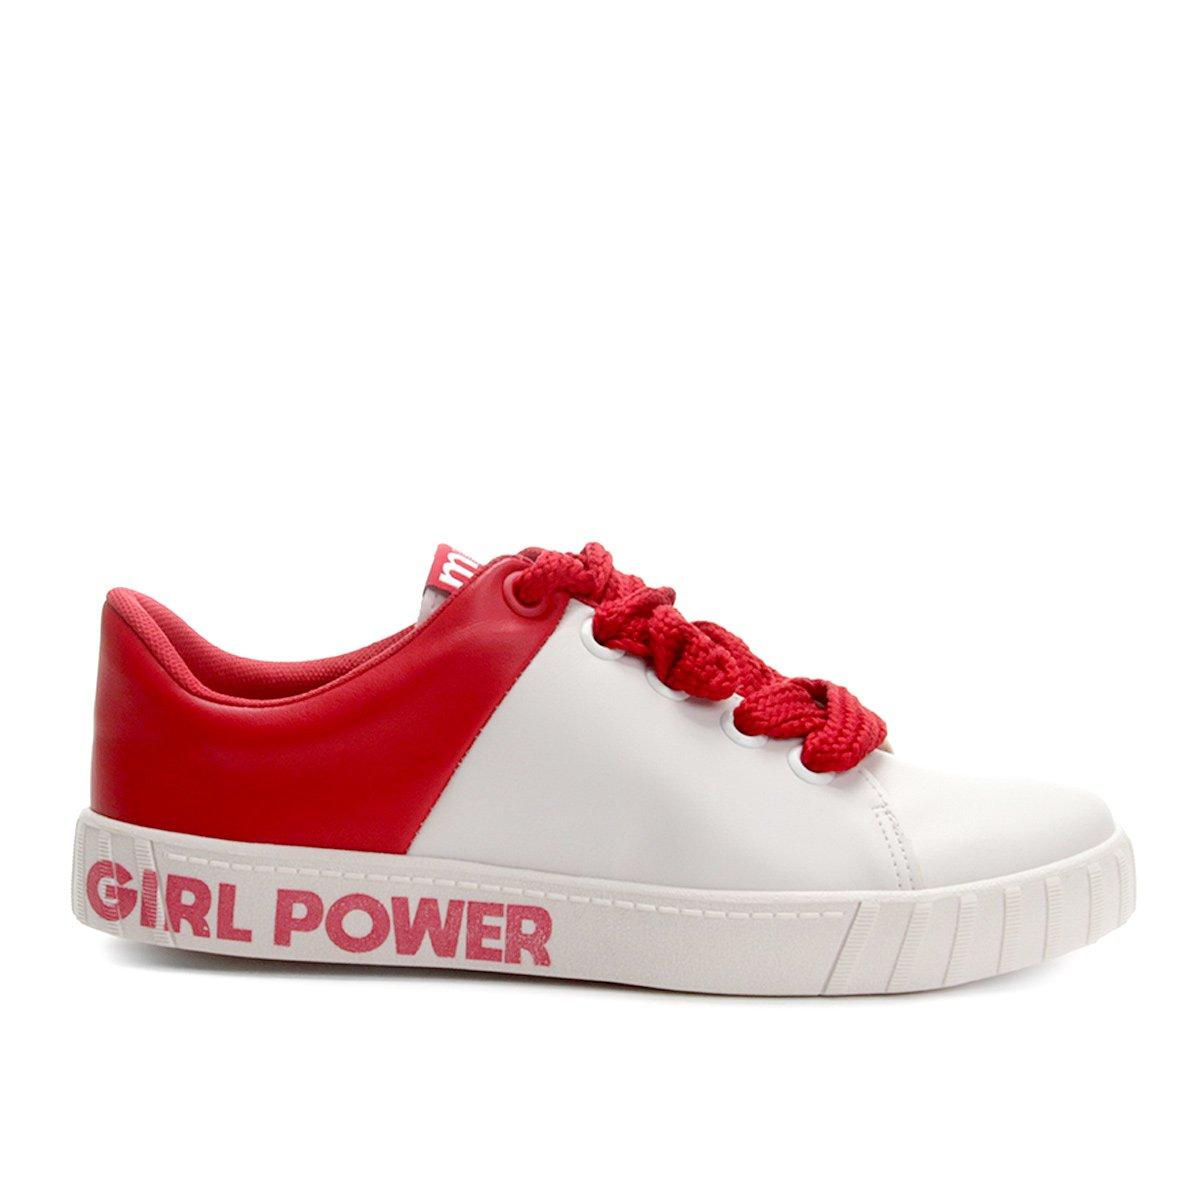 Tênis Girl Tênis Branco Power Moleca Branco Feminino Girl Feminino e Moleca Power Vermelho 1wZqXAB